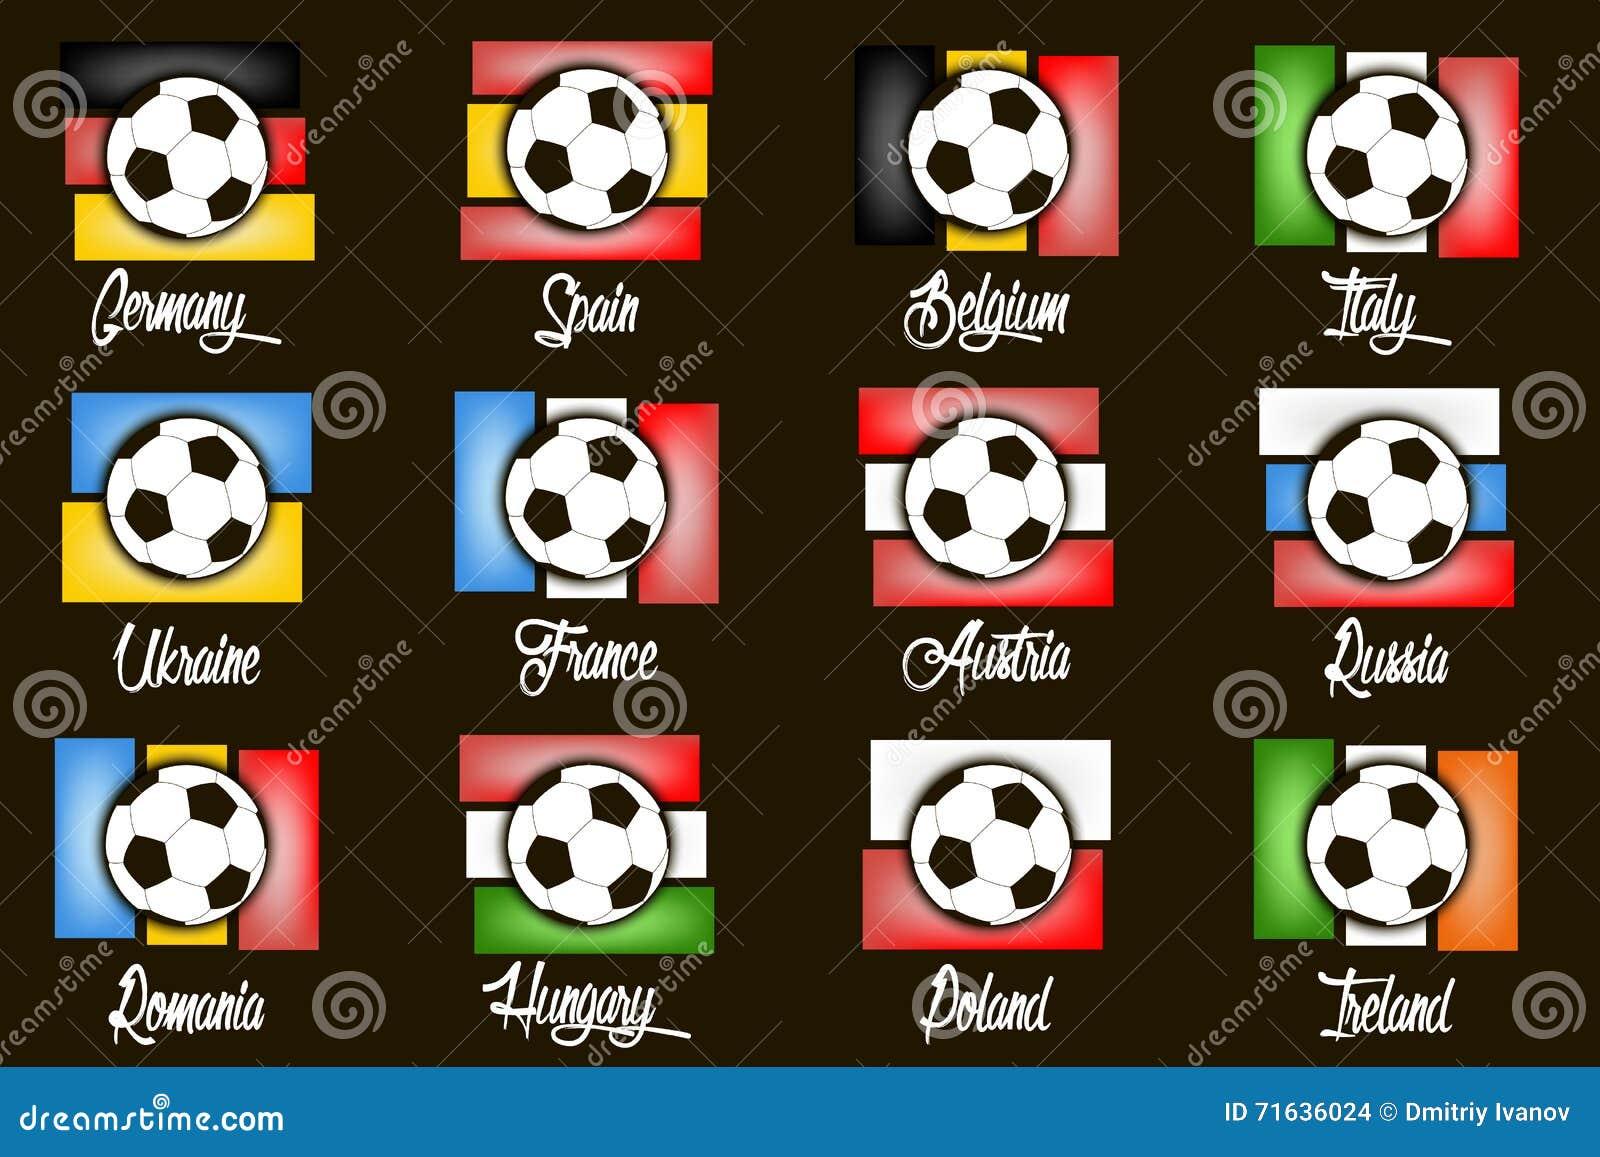 how to start a flag football team